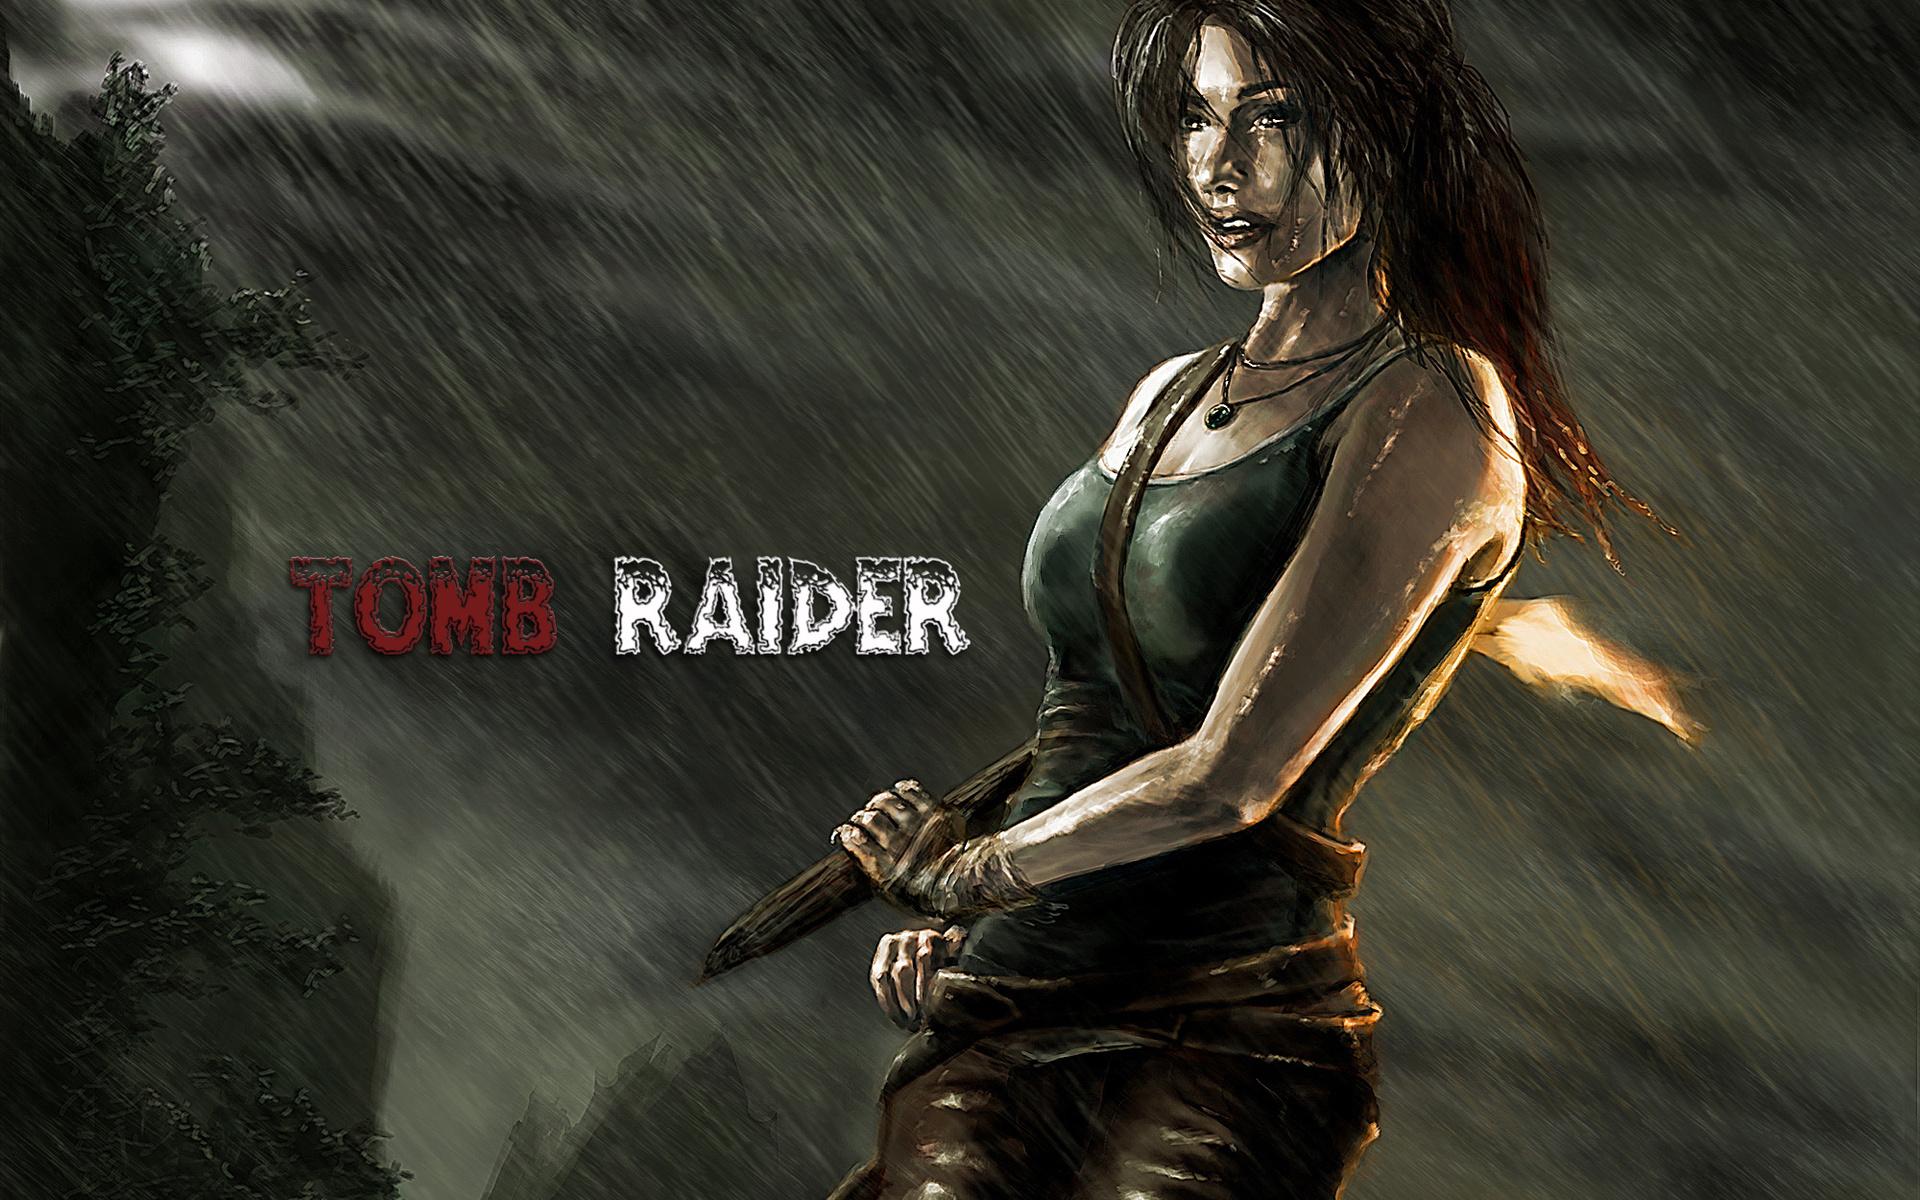 Tomb Raider HD Wallpaper   Background Image   1920x1200 ...